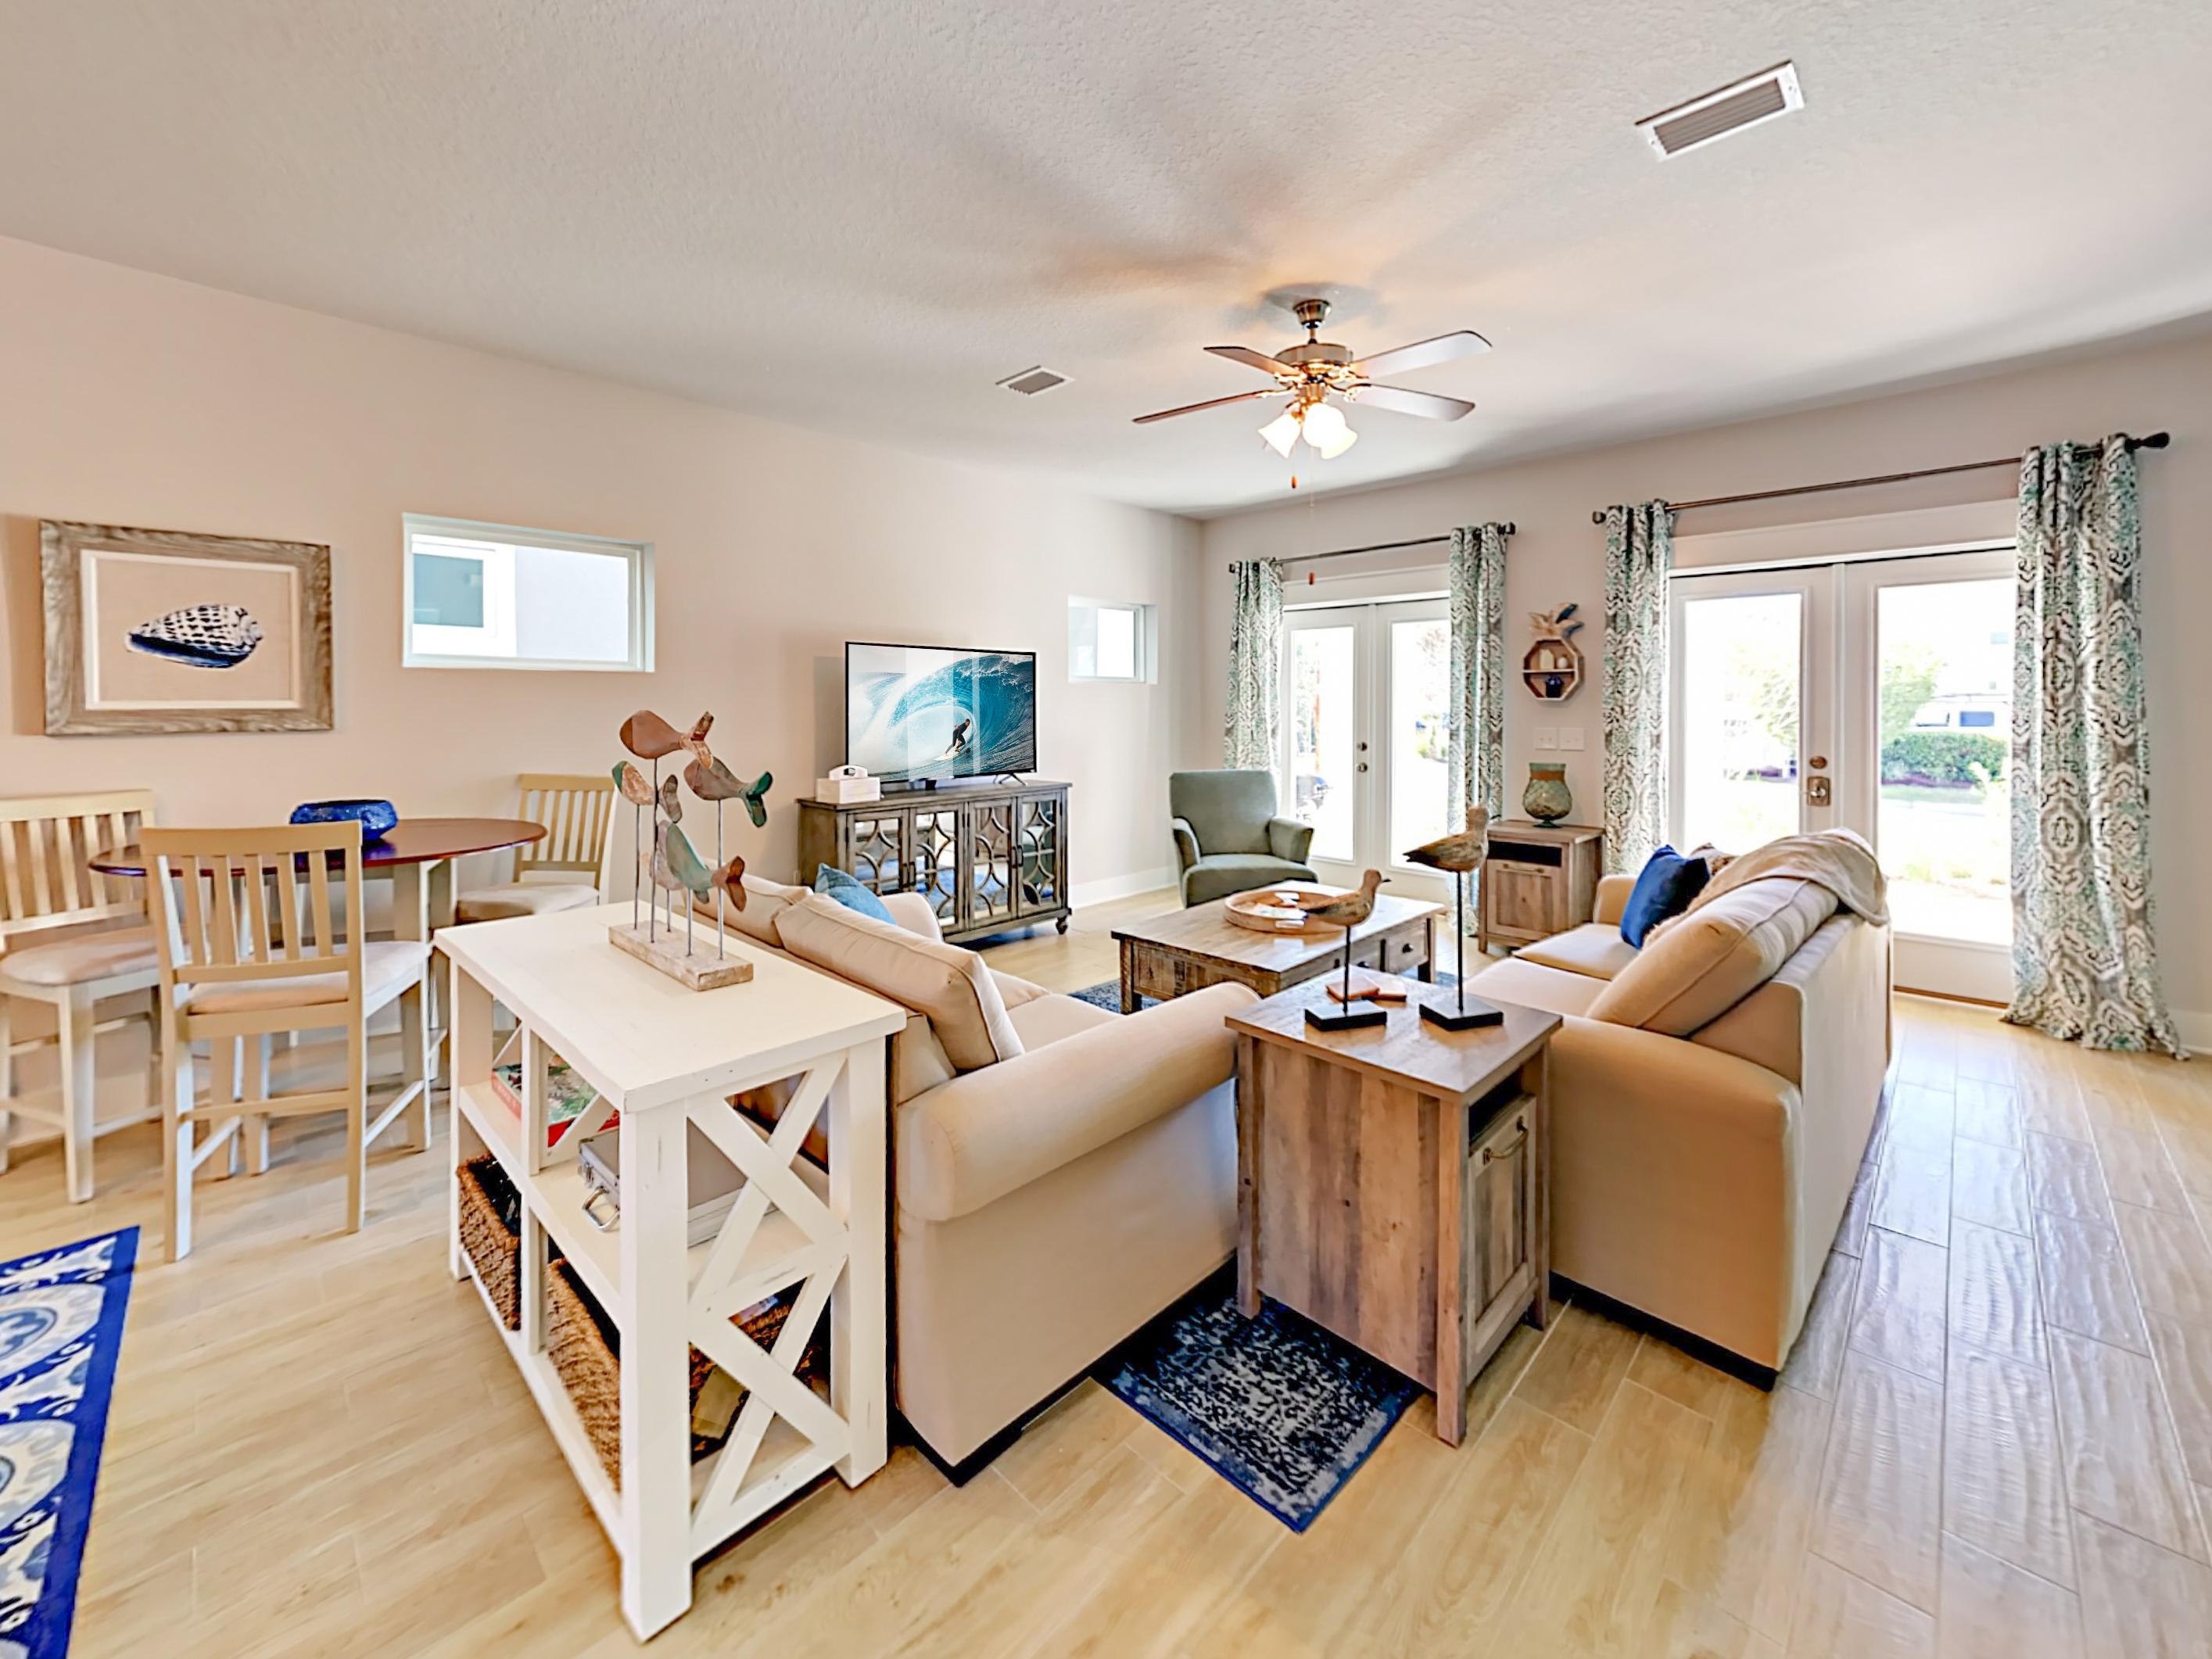 Pensacola FL Vacation Rental Welcome to Perdido